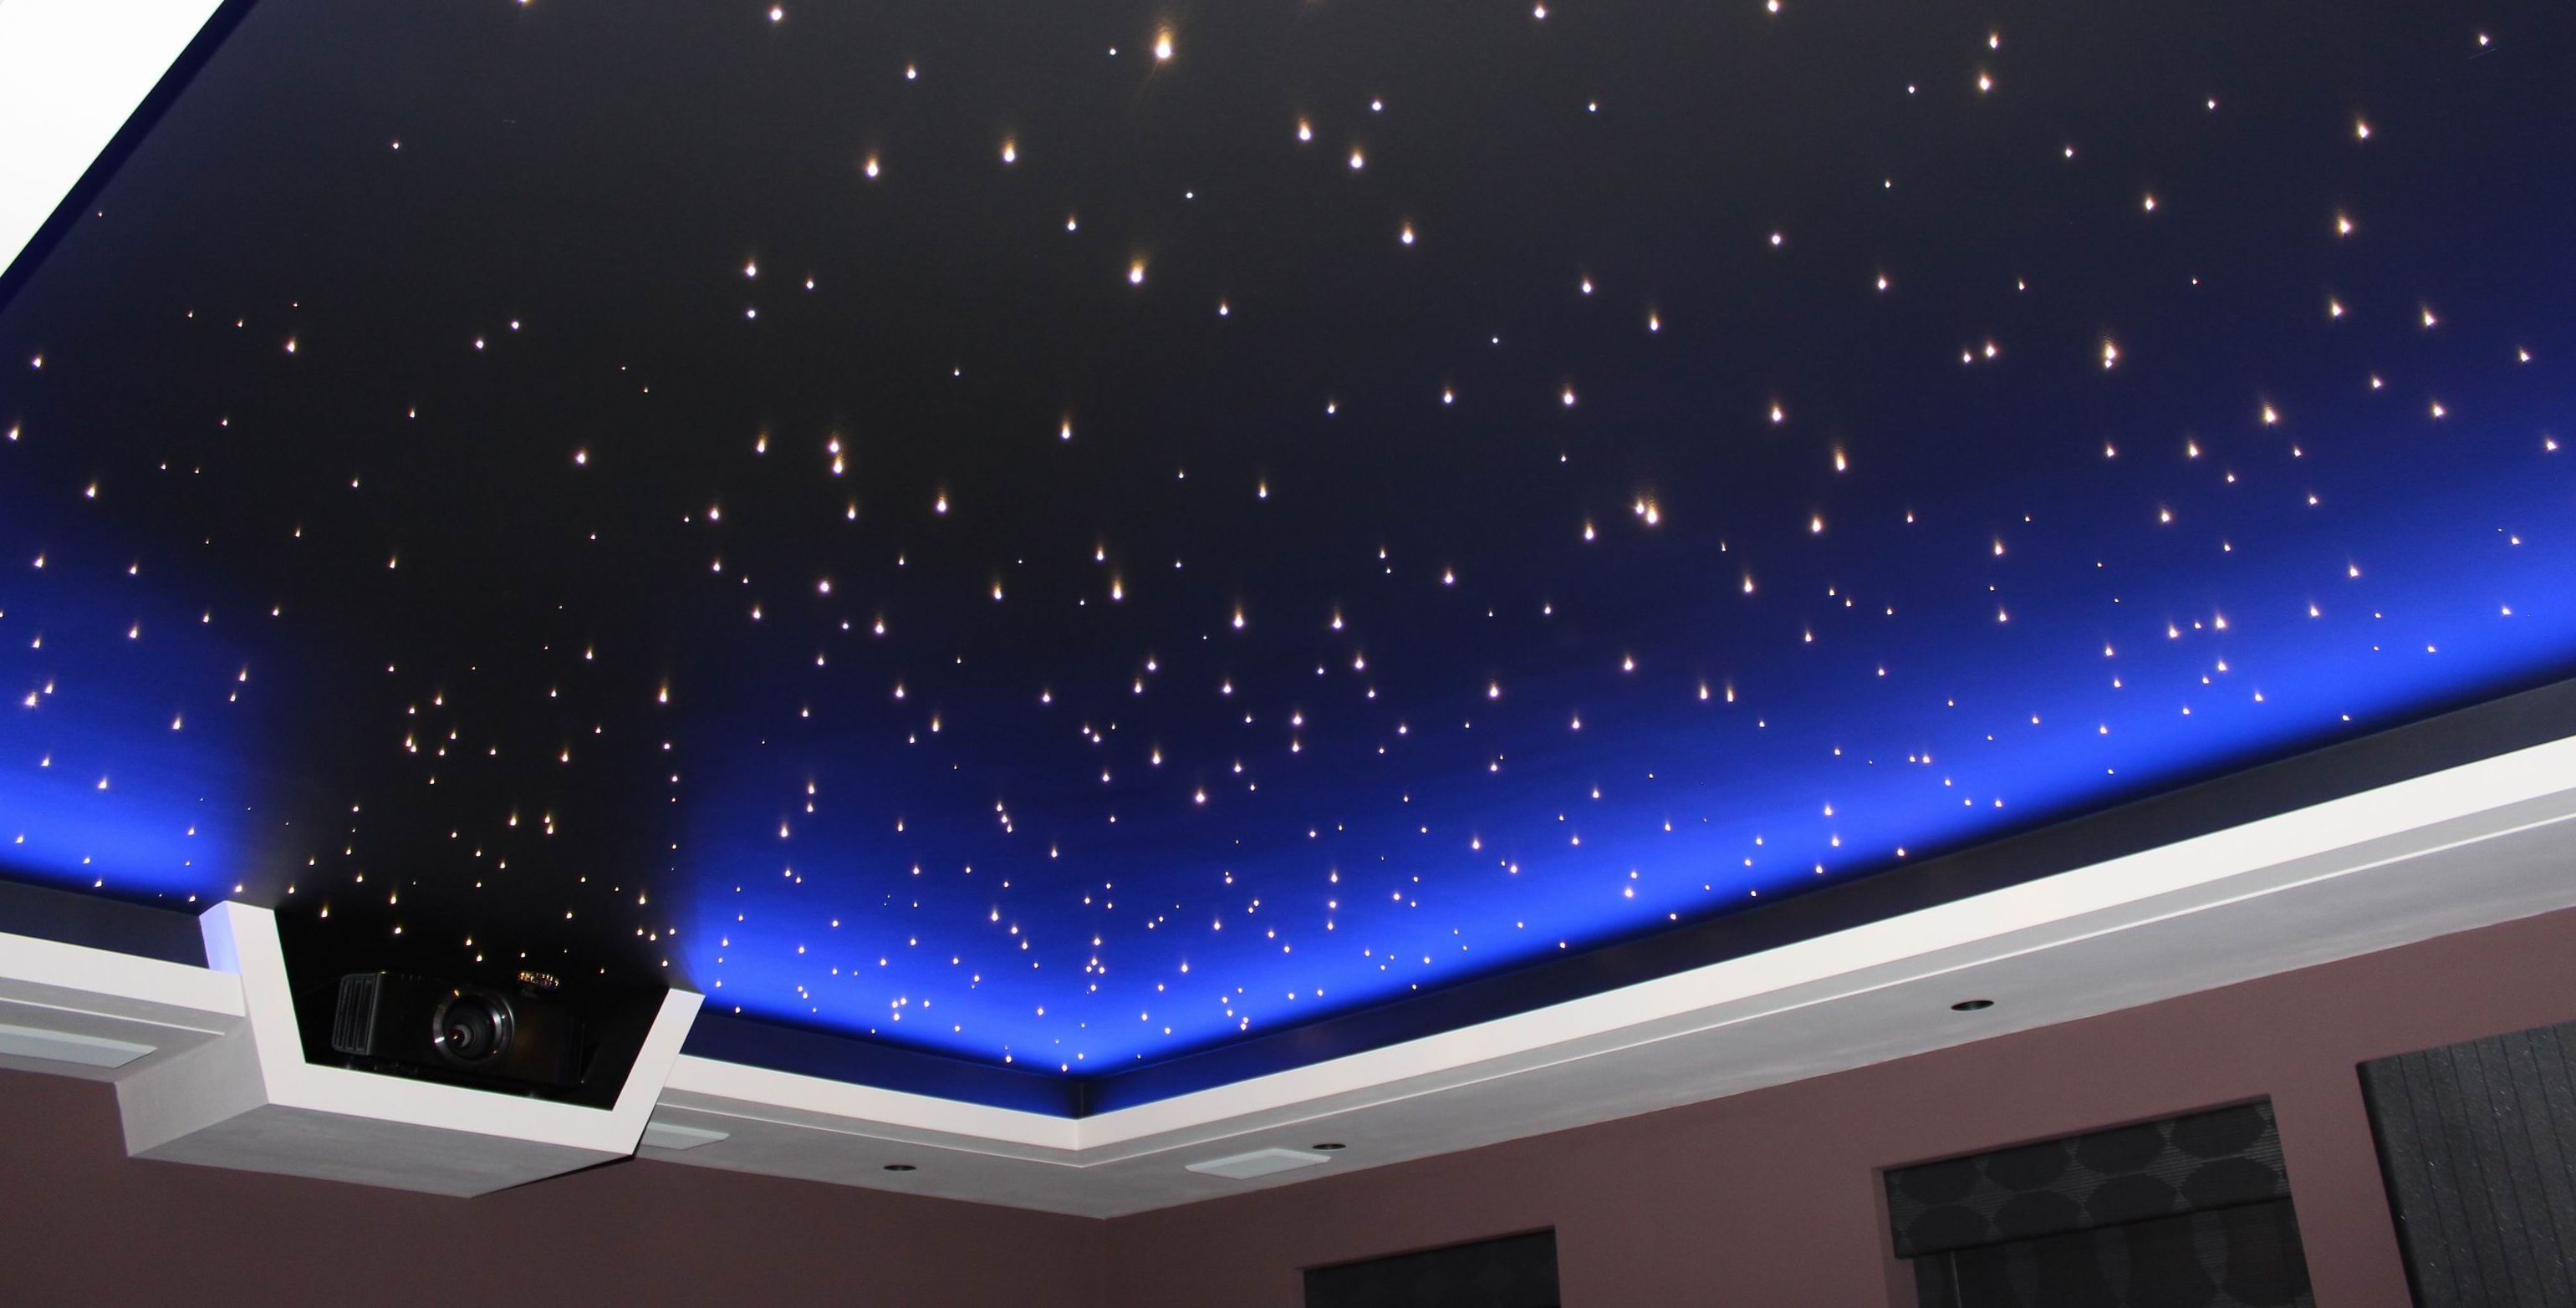 Light That Shines Stars On Ceiling | Star lights on ...